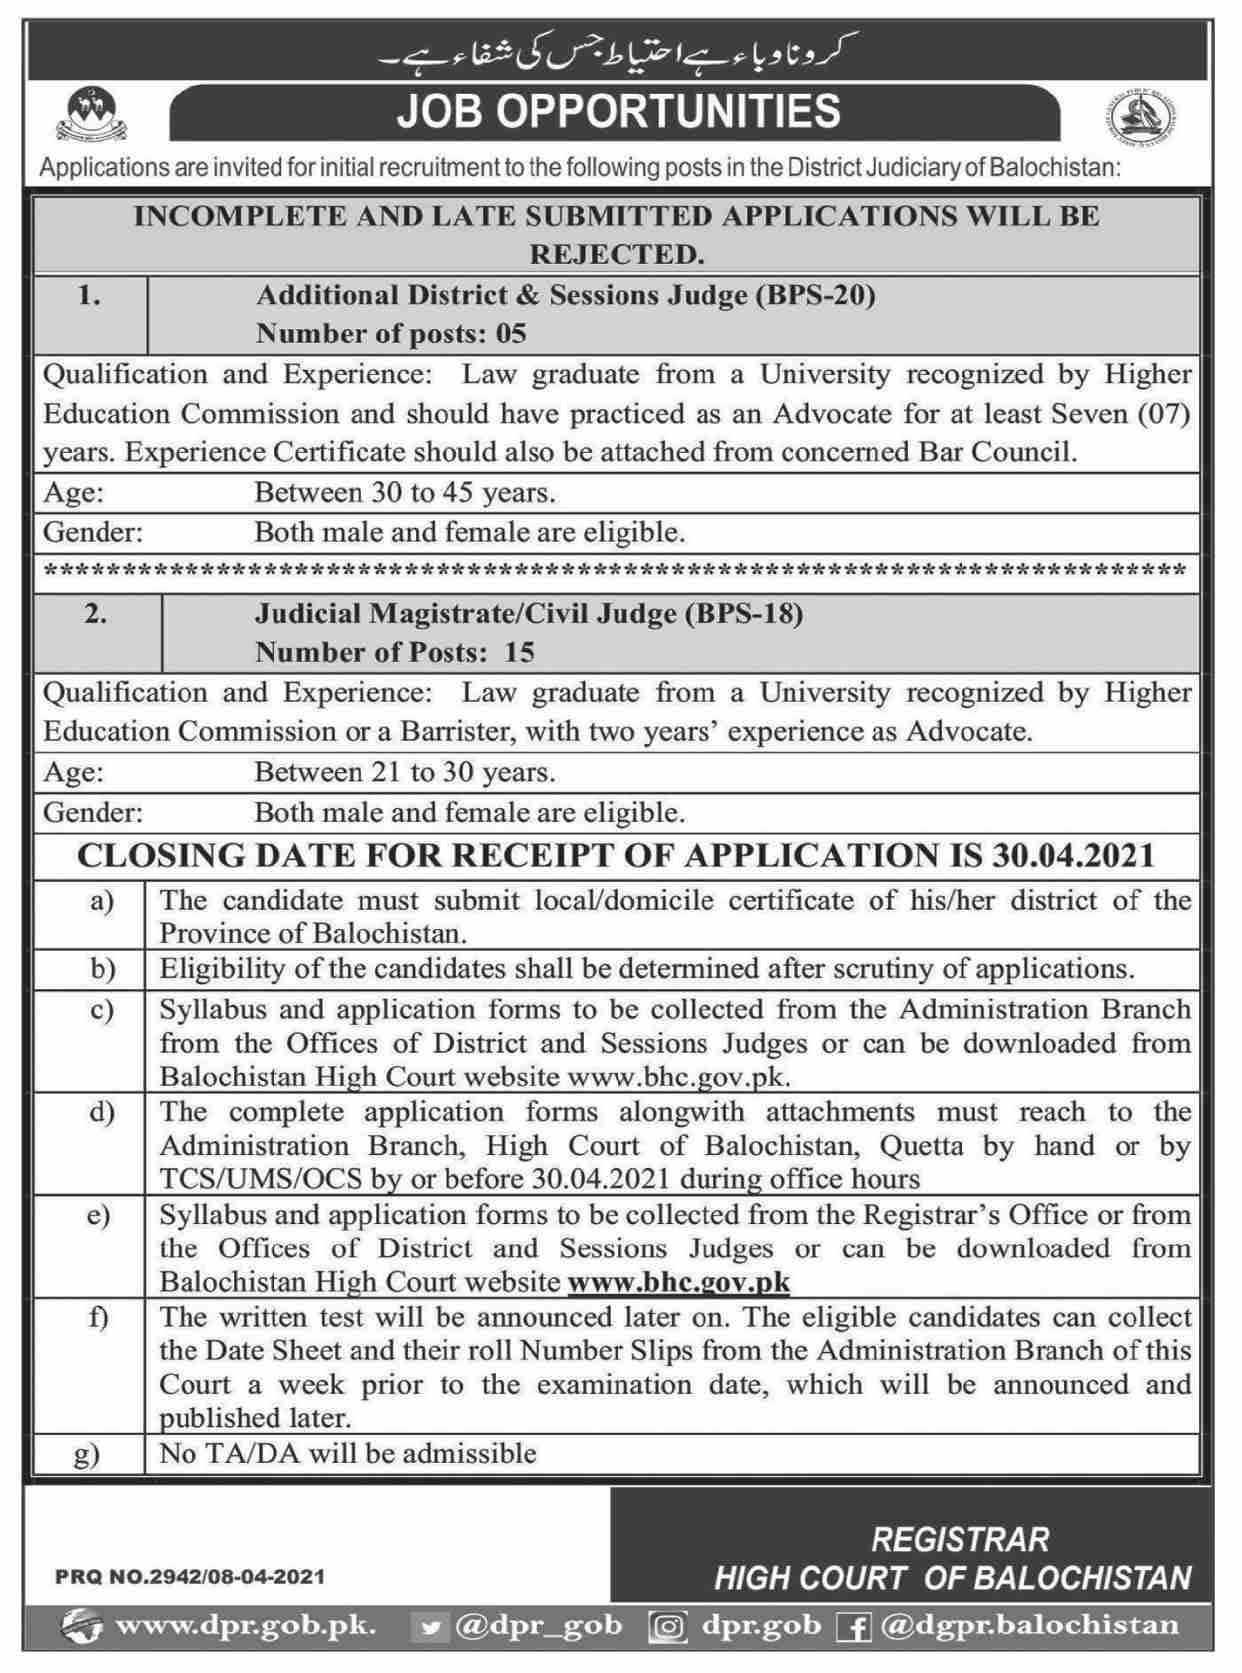 Balochistan District Judiciary Jobs April 2021